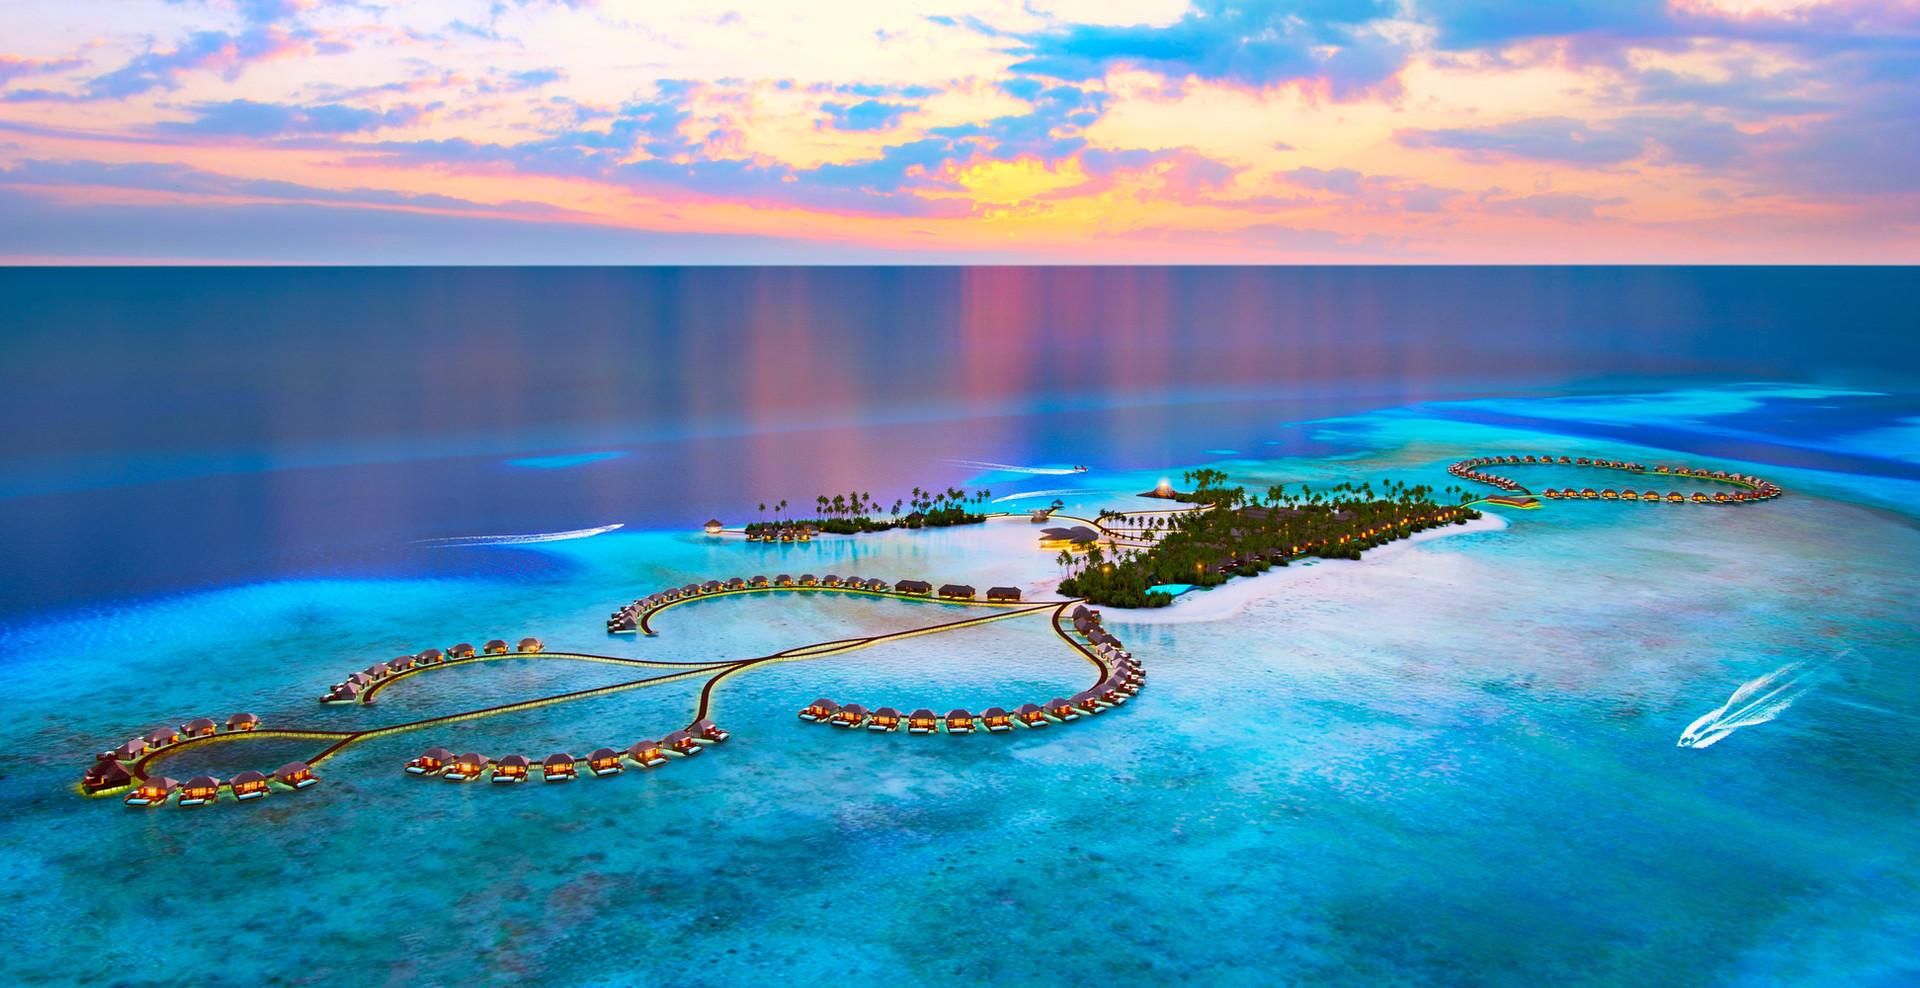 Radisson Blu Maldives_Sunset.jpg